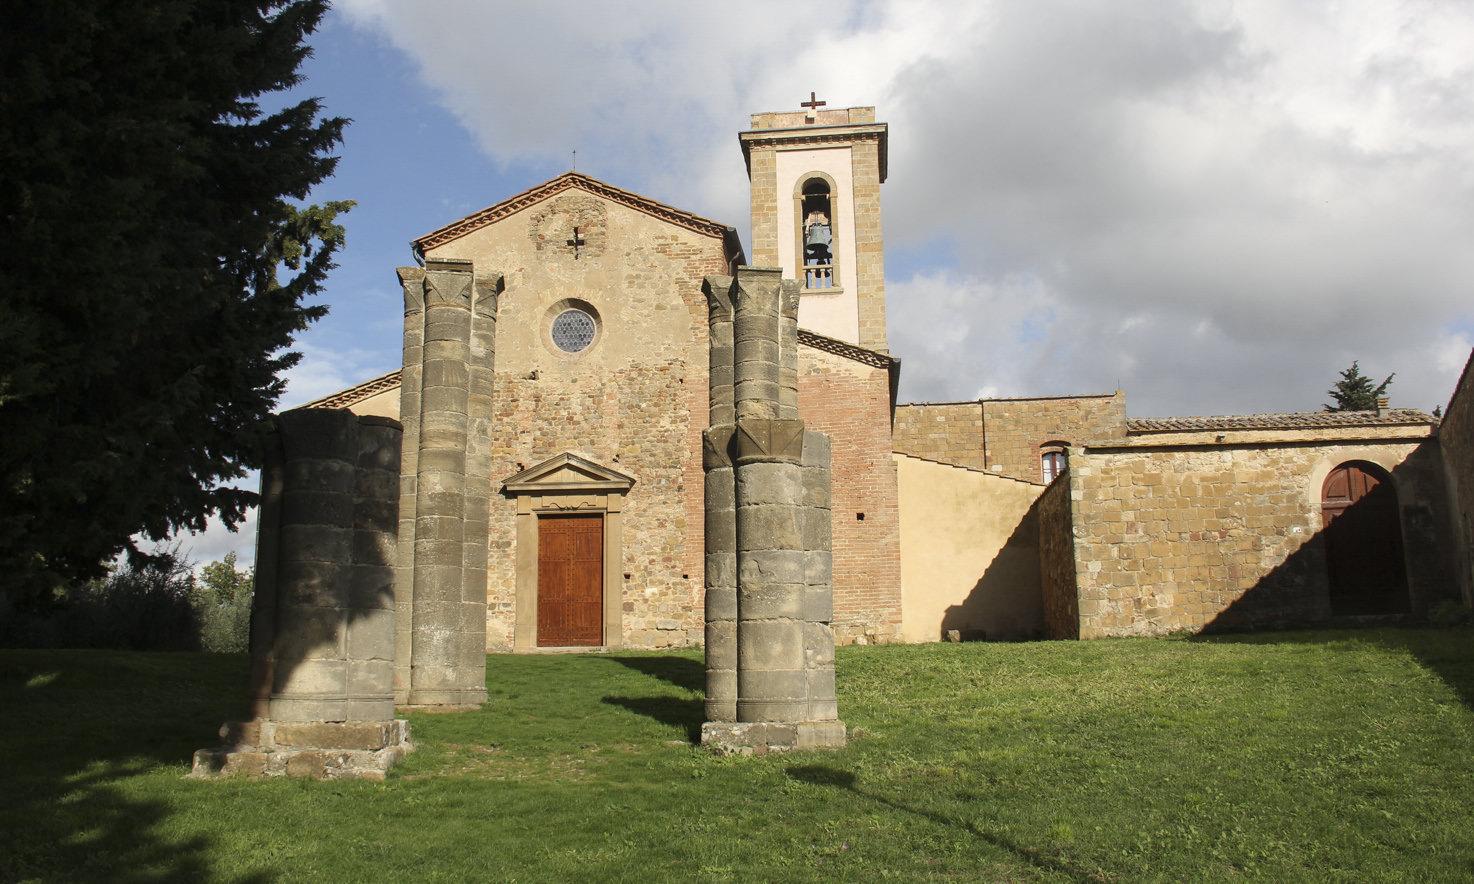 Façade of the romanesque church Pieve di Sant'Appiano